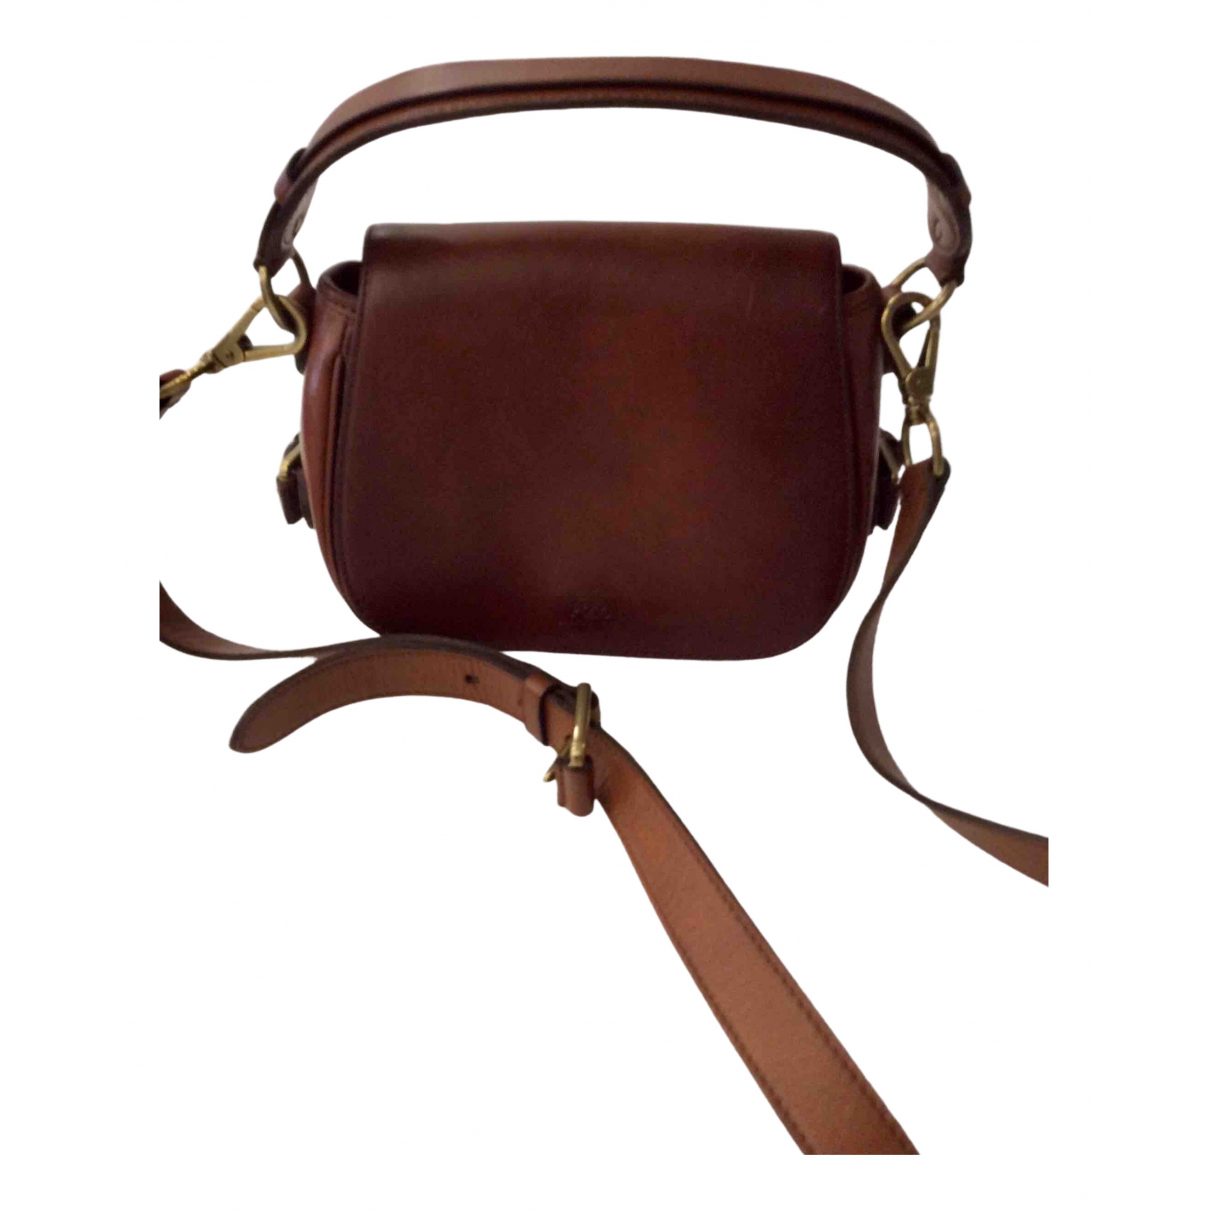 Polo Ralph Lauren - Sac a main   pour femme en cuir - marron